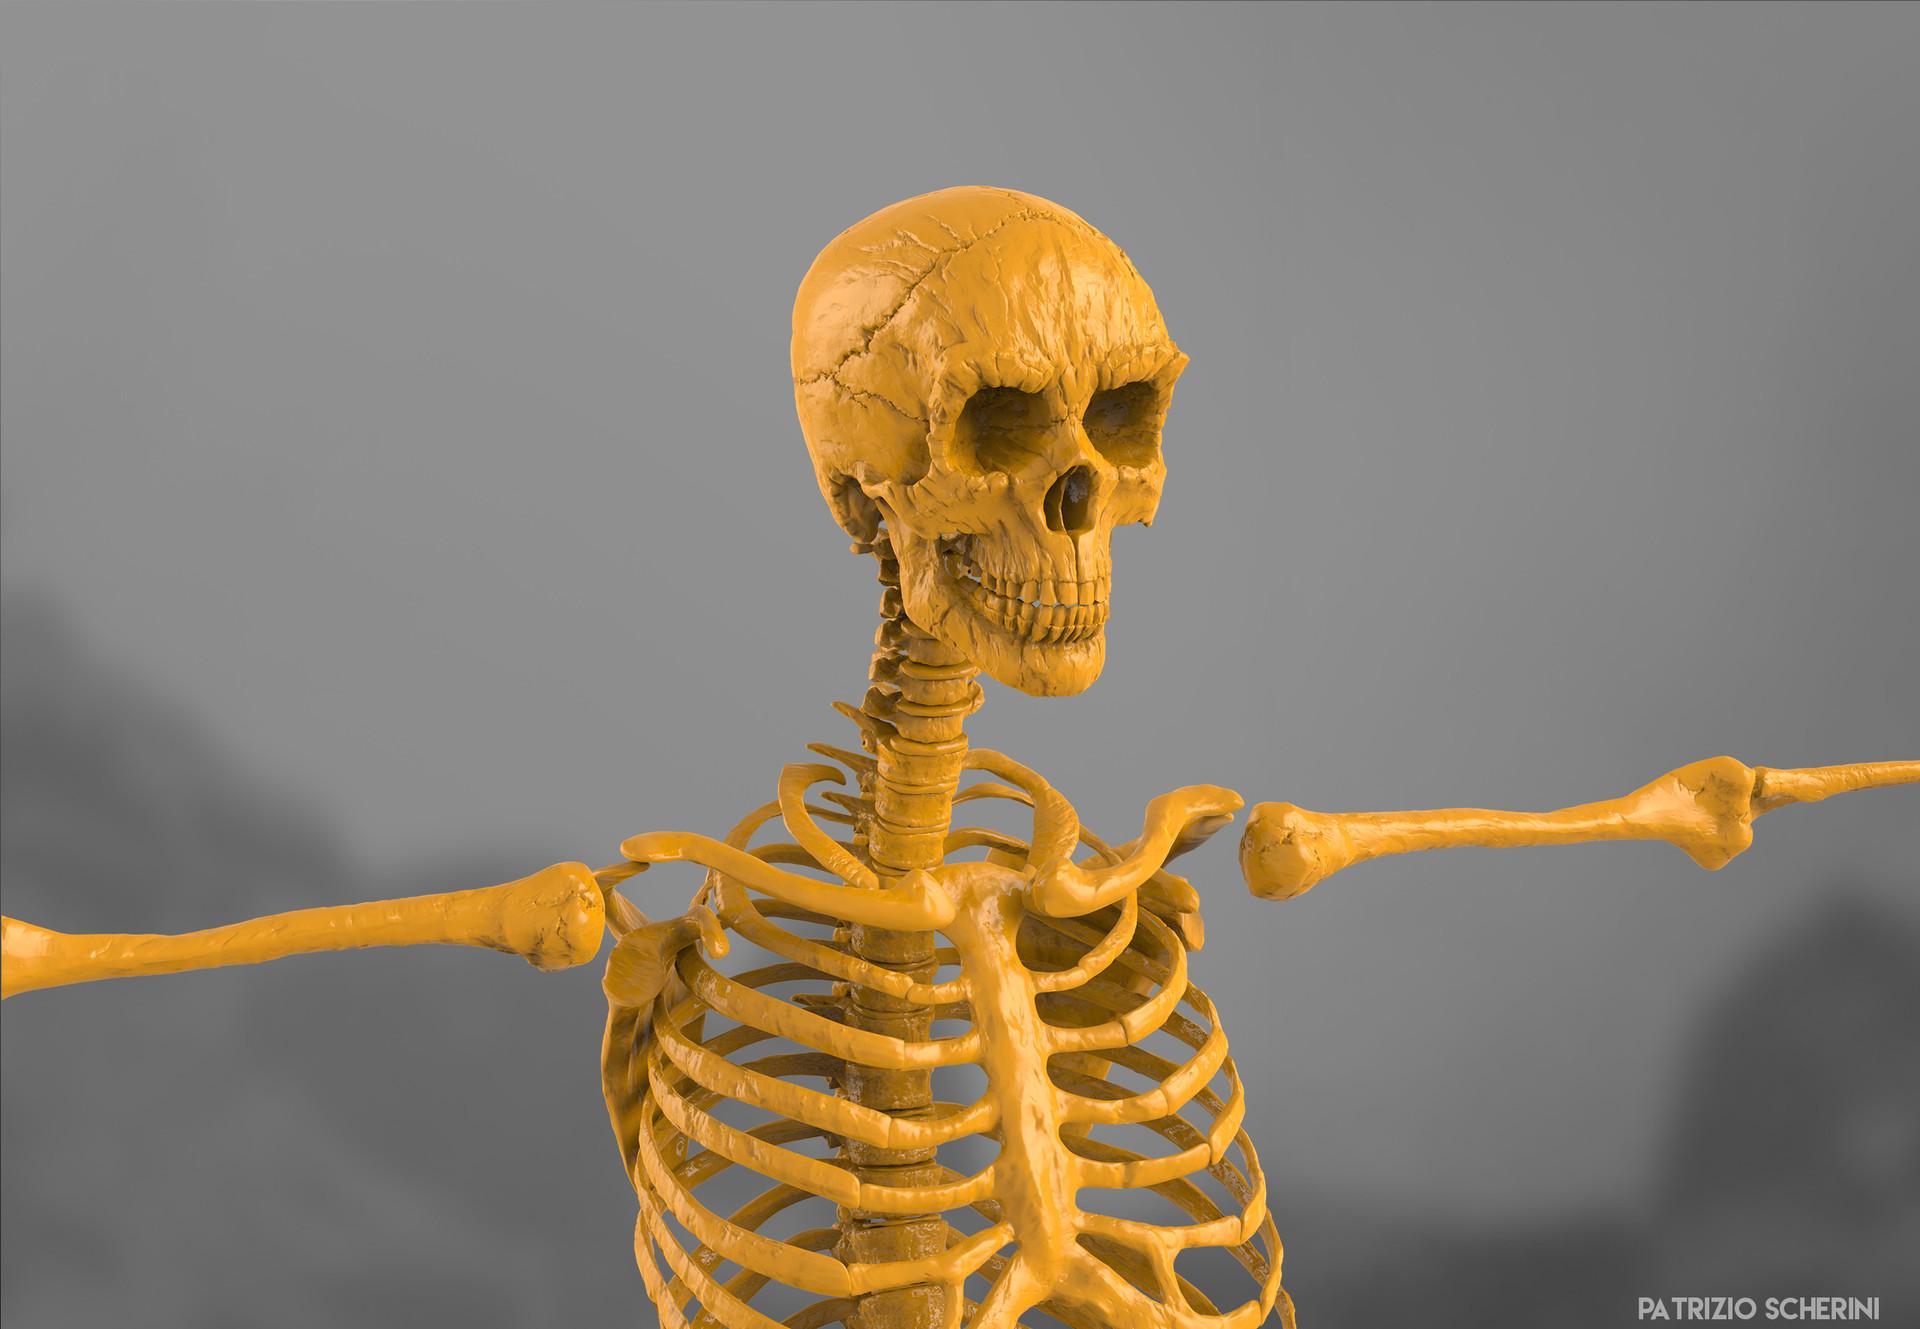 Patrizio scherini skeletro 09 front